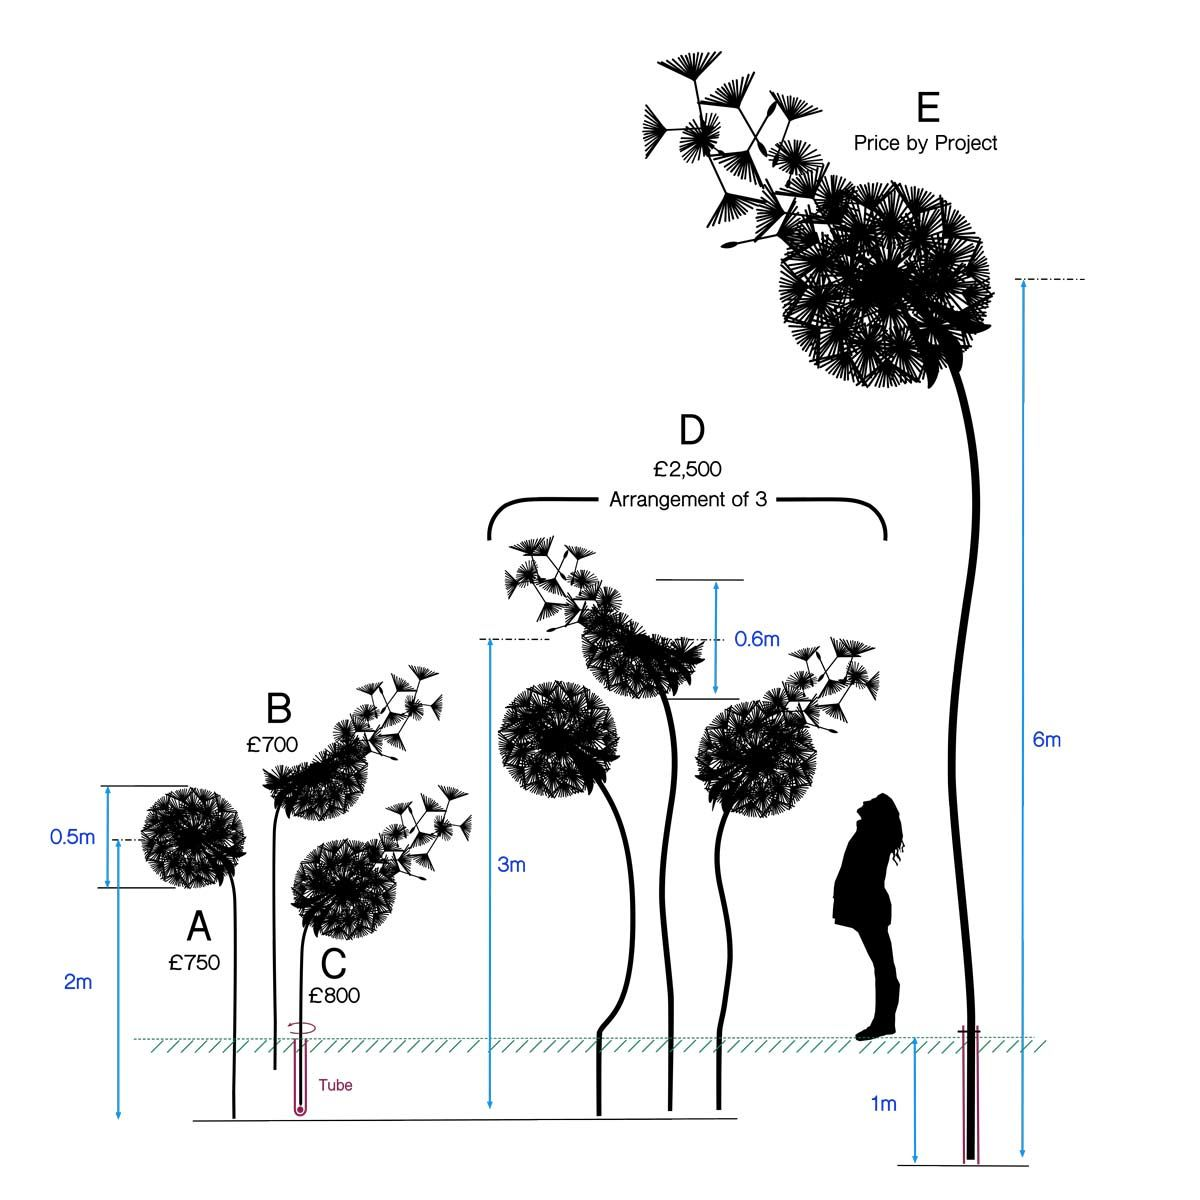 dandelion sizes   Metal Artwork   Pinterest   Dandelions, Urban ...